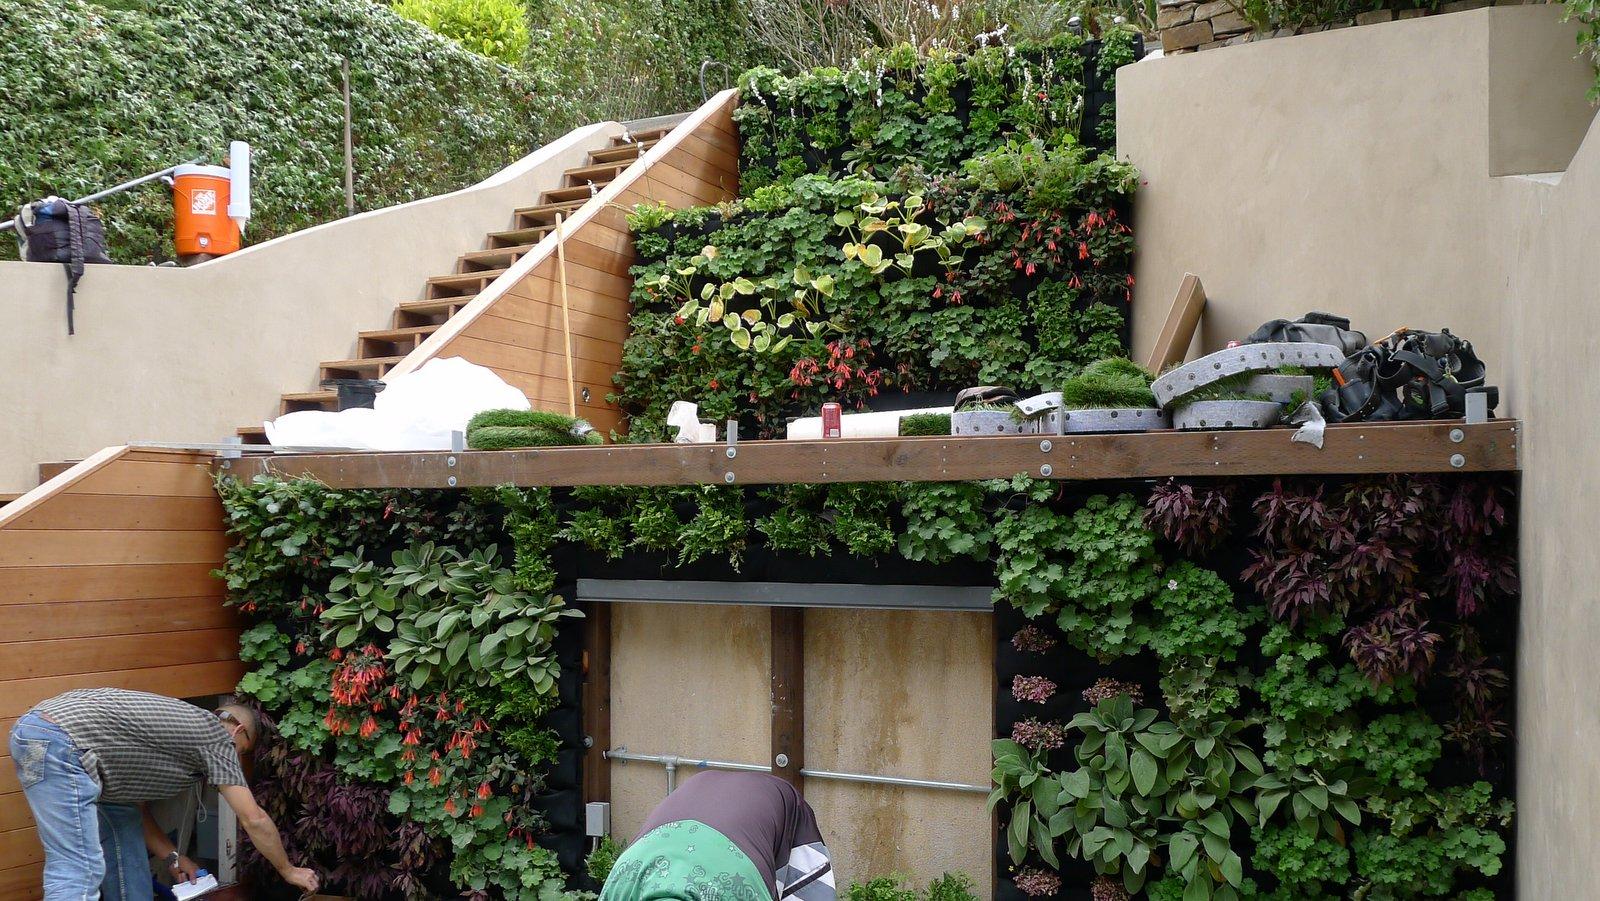 Plants On Walls Vertical Garden Systems: Terraced Vertical